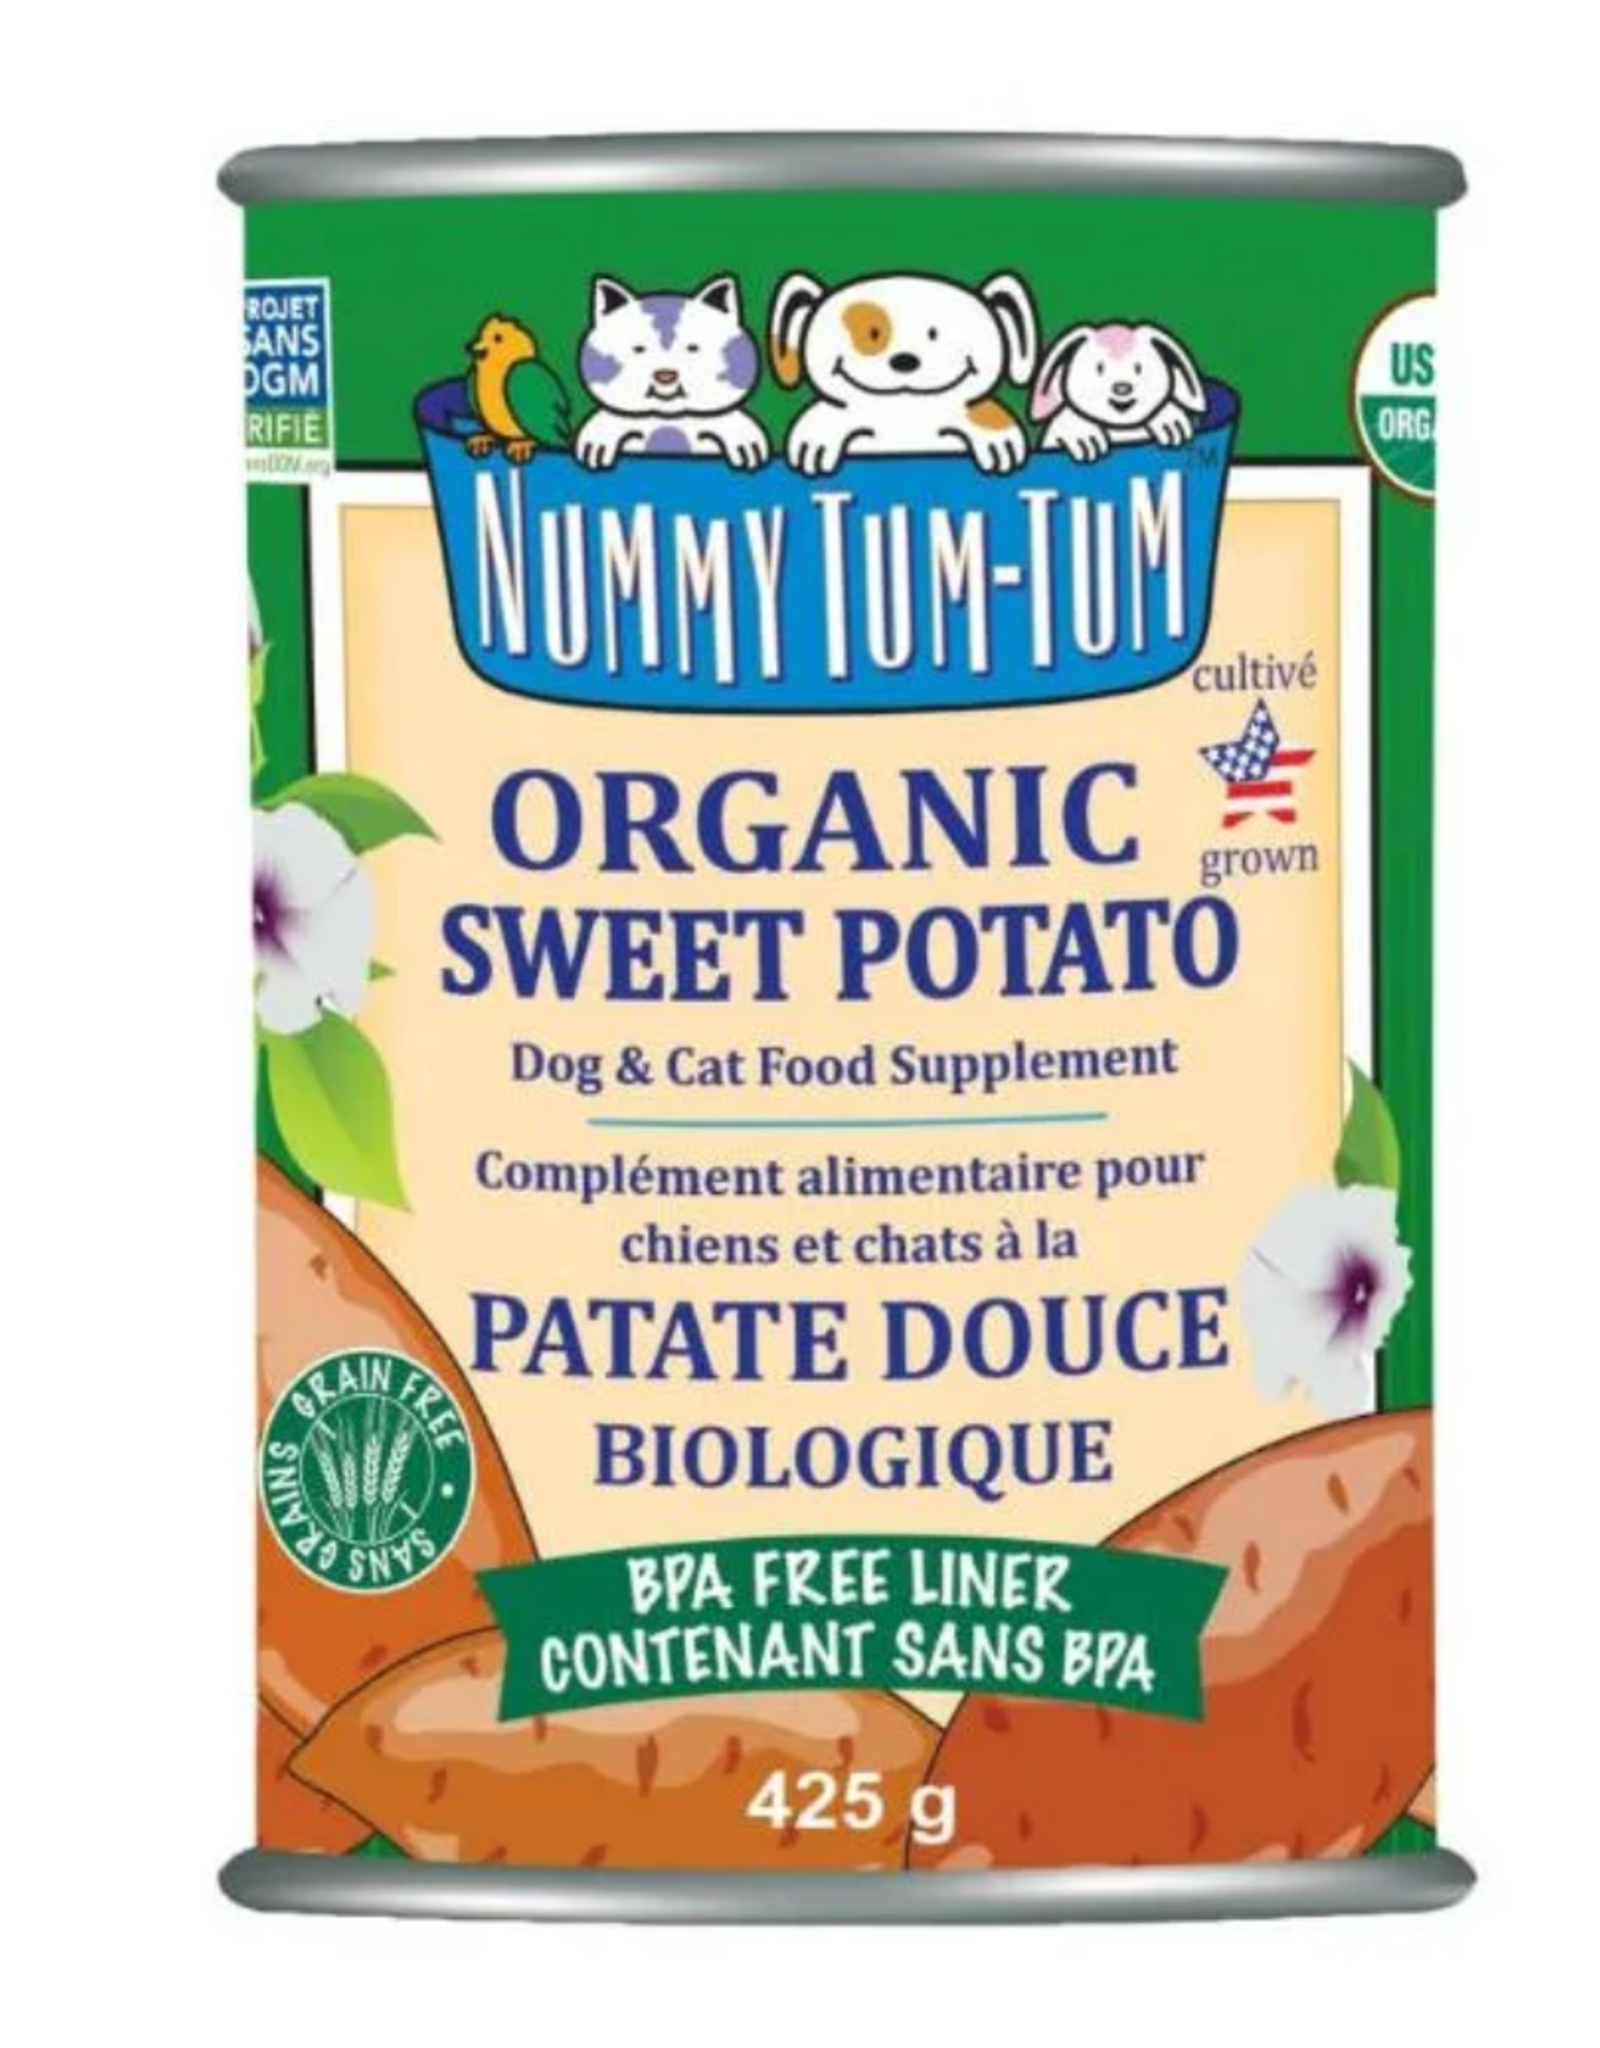 Nummy Tum-Tum Nummy Tum-Tum - Organic Sweet Potato